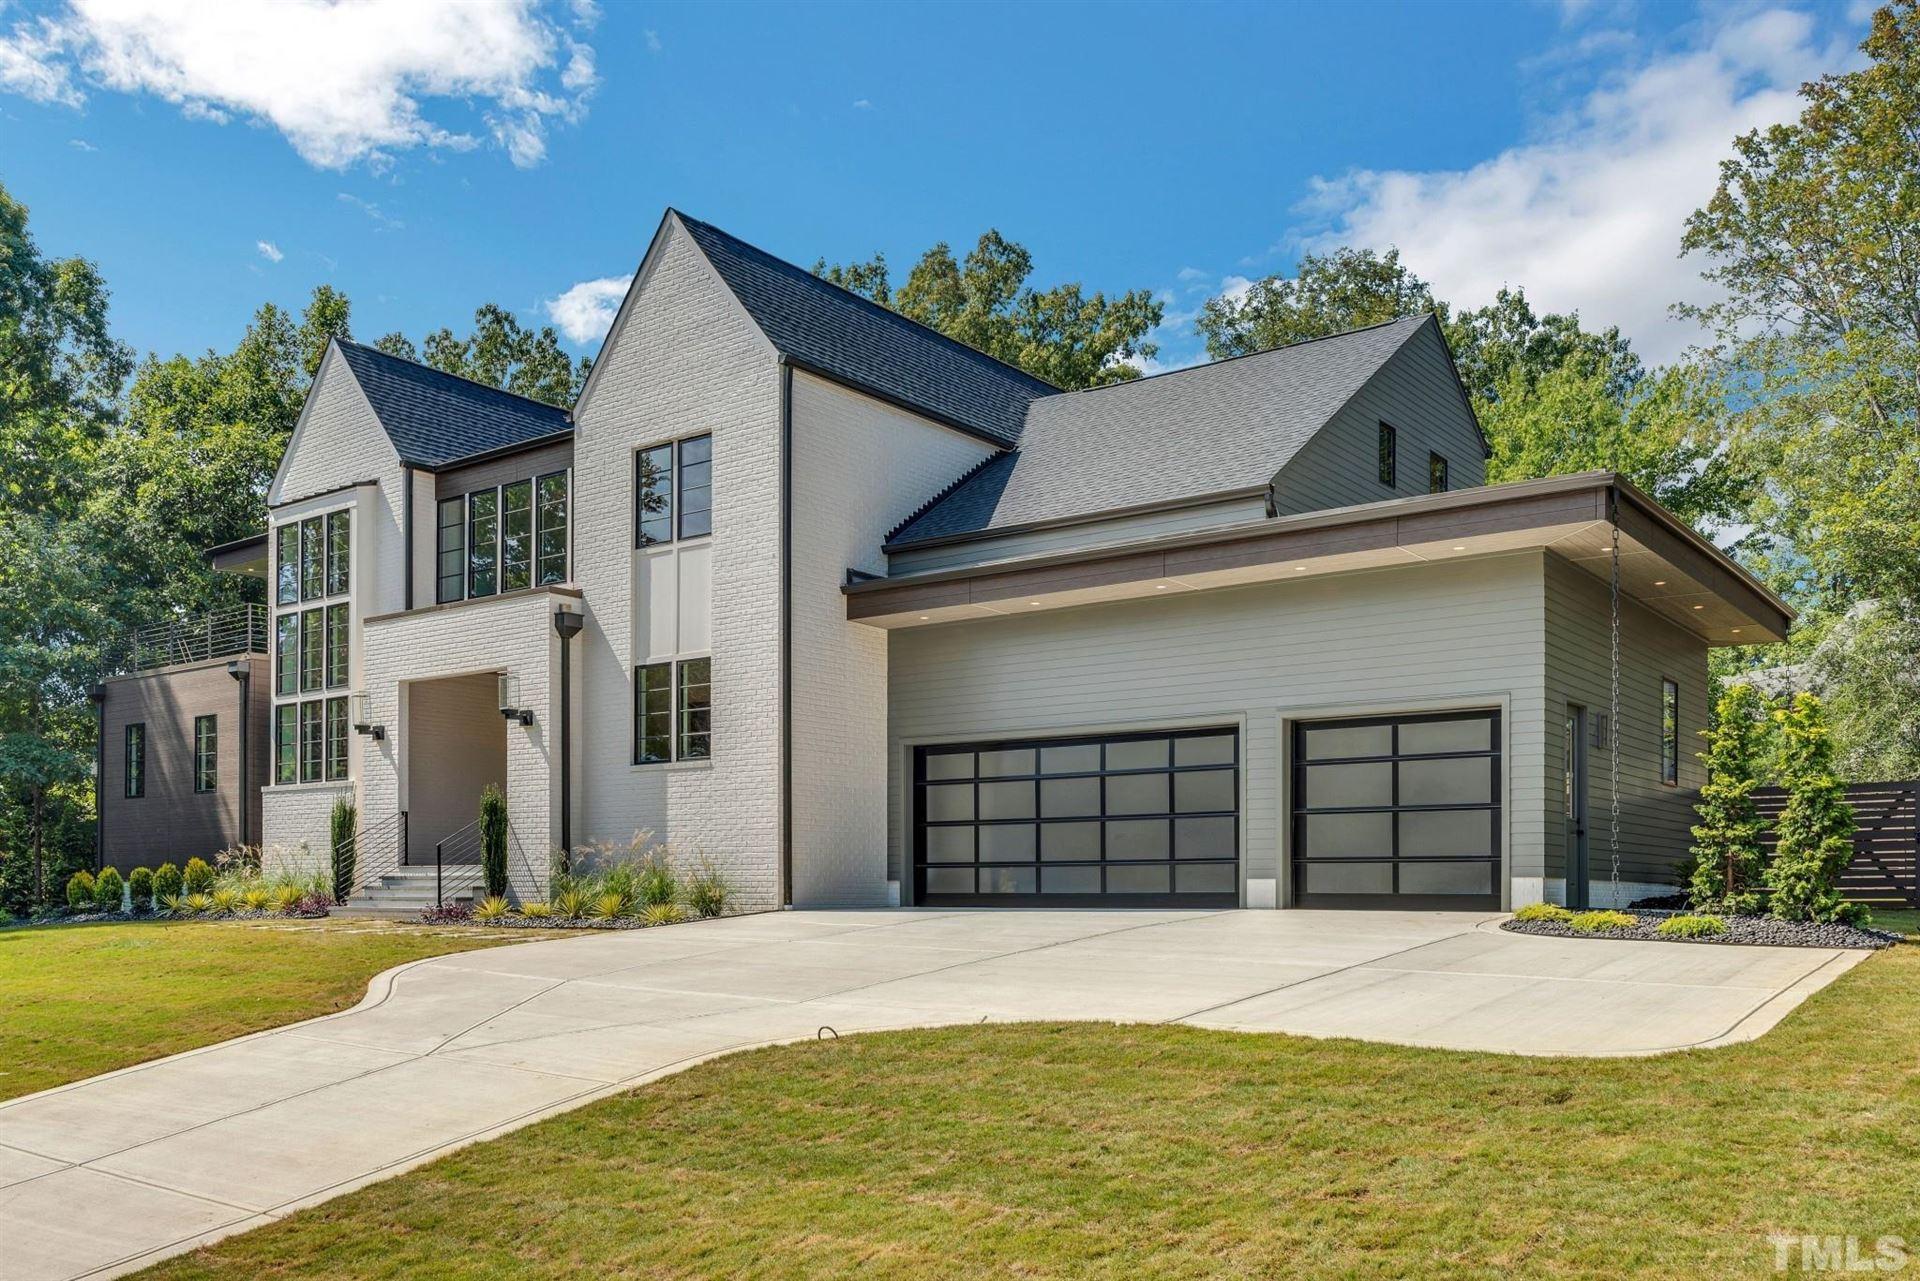 Photo of 1401 Hedgelawn Way, Raleigh, NC 27615 (MLS # 2392339)